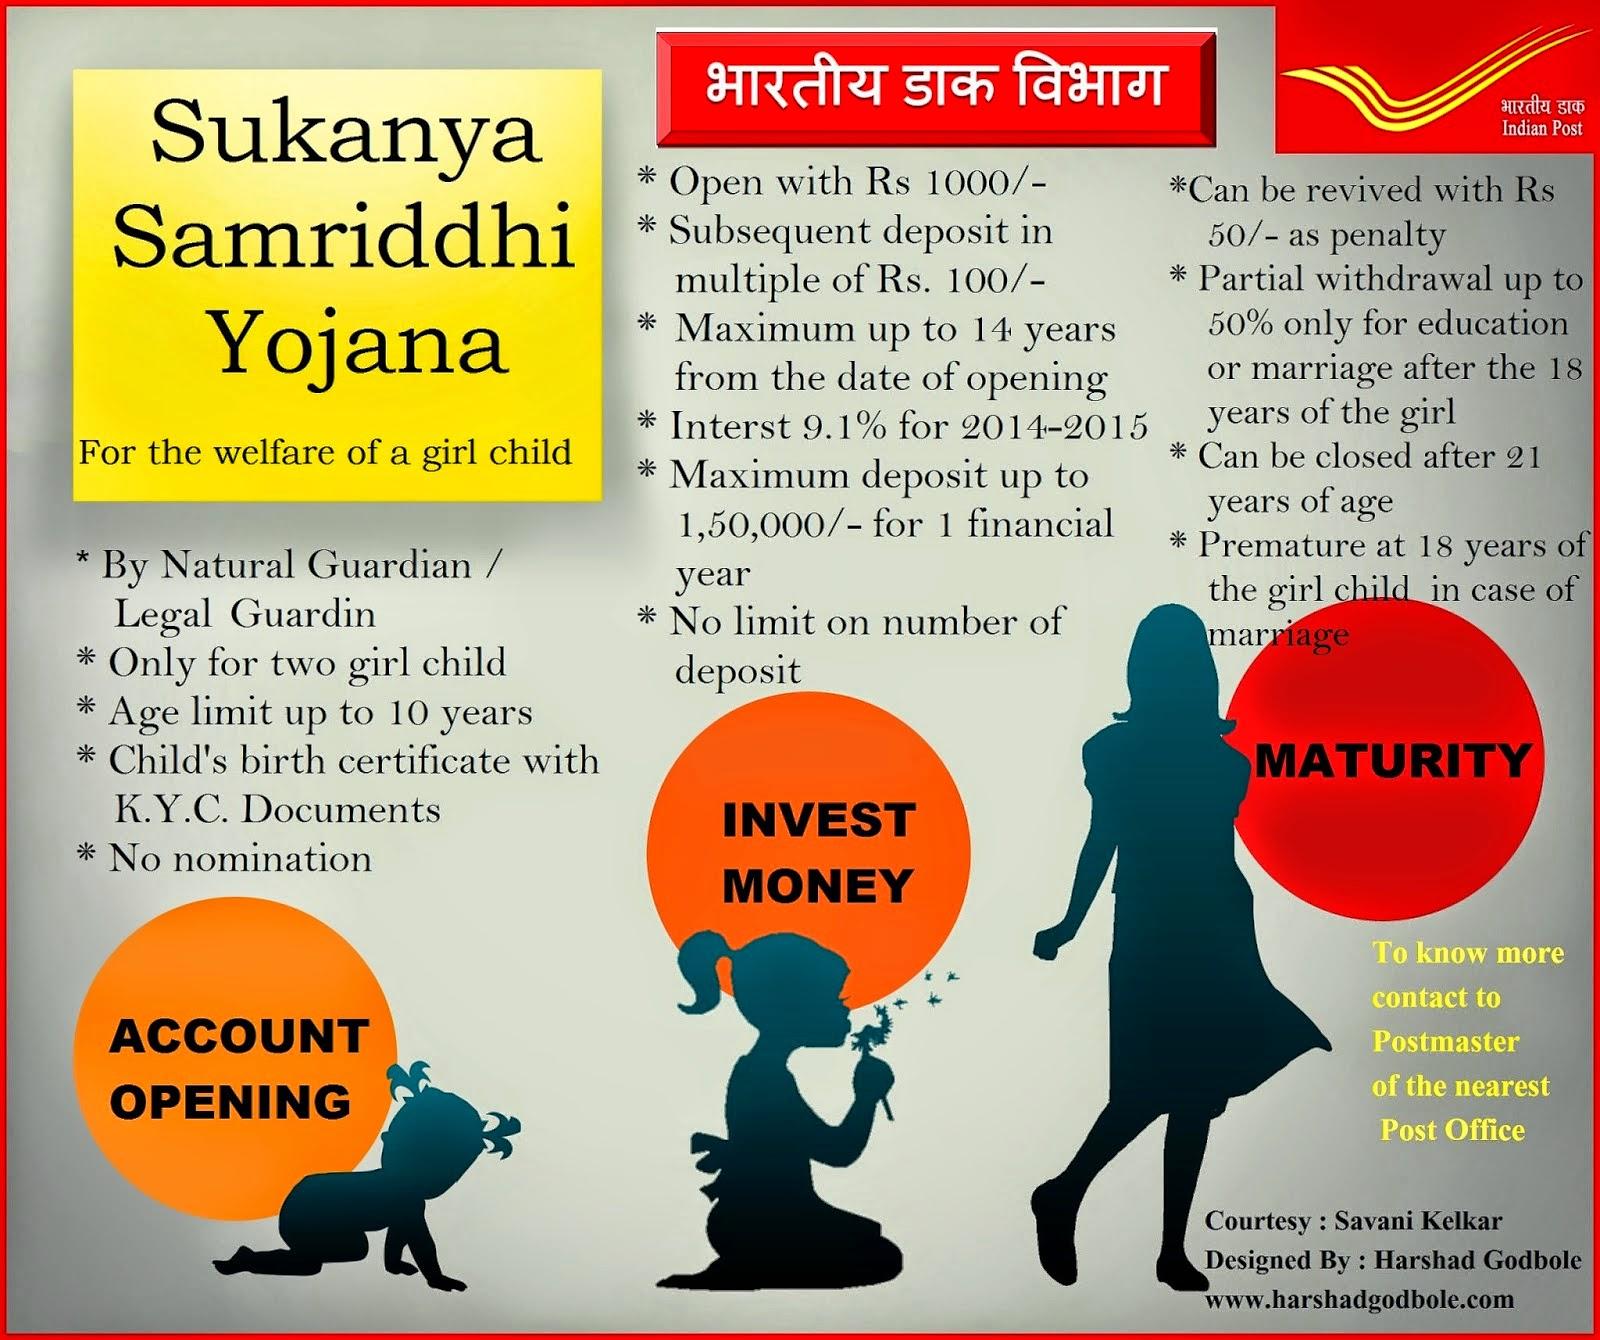 System Administrators, Indiapost.: Sukanya Samriddhi